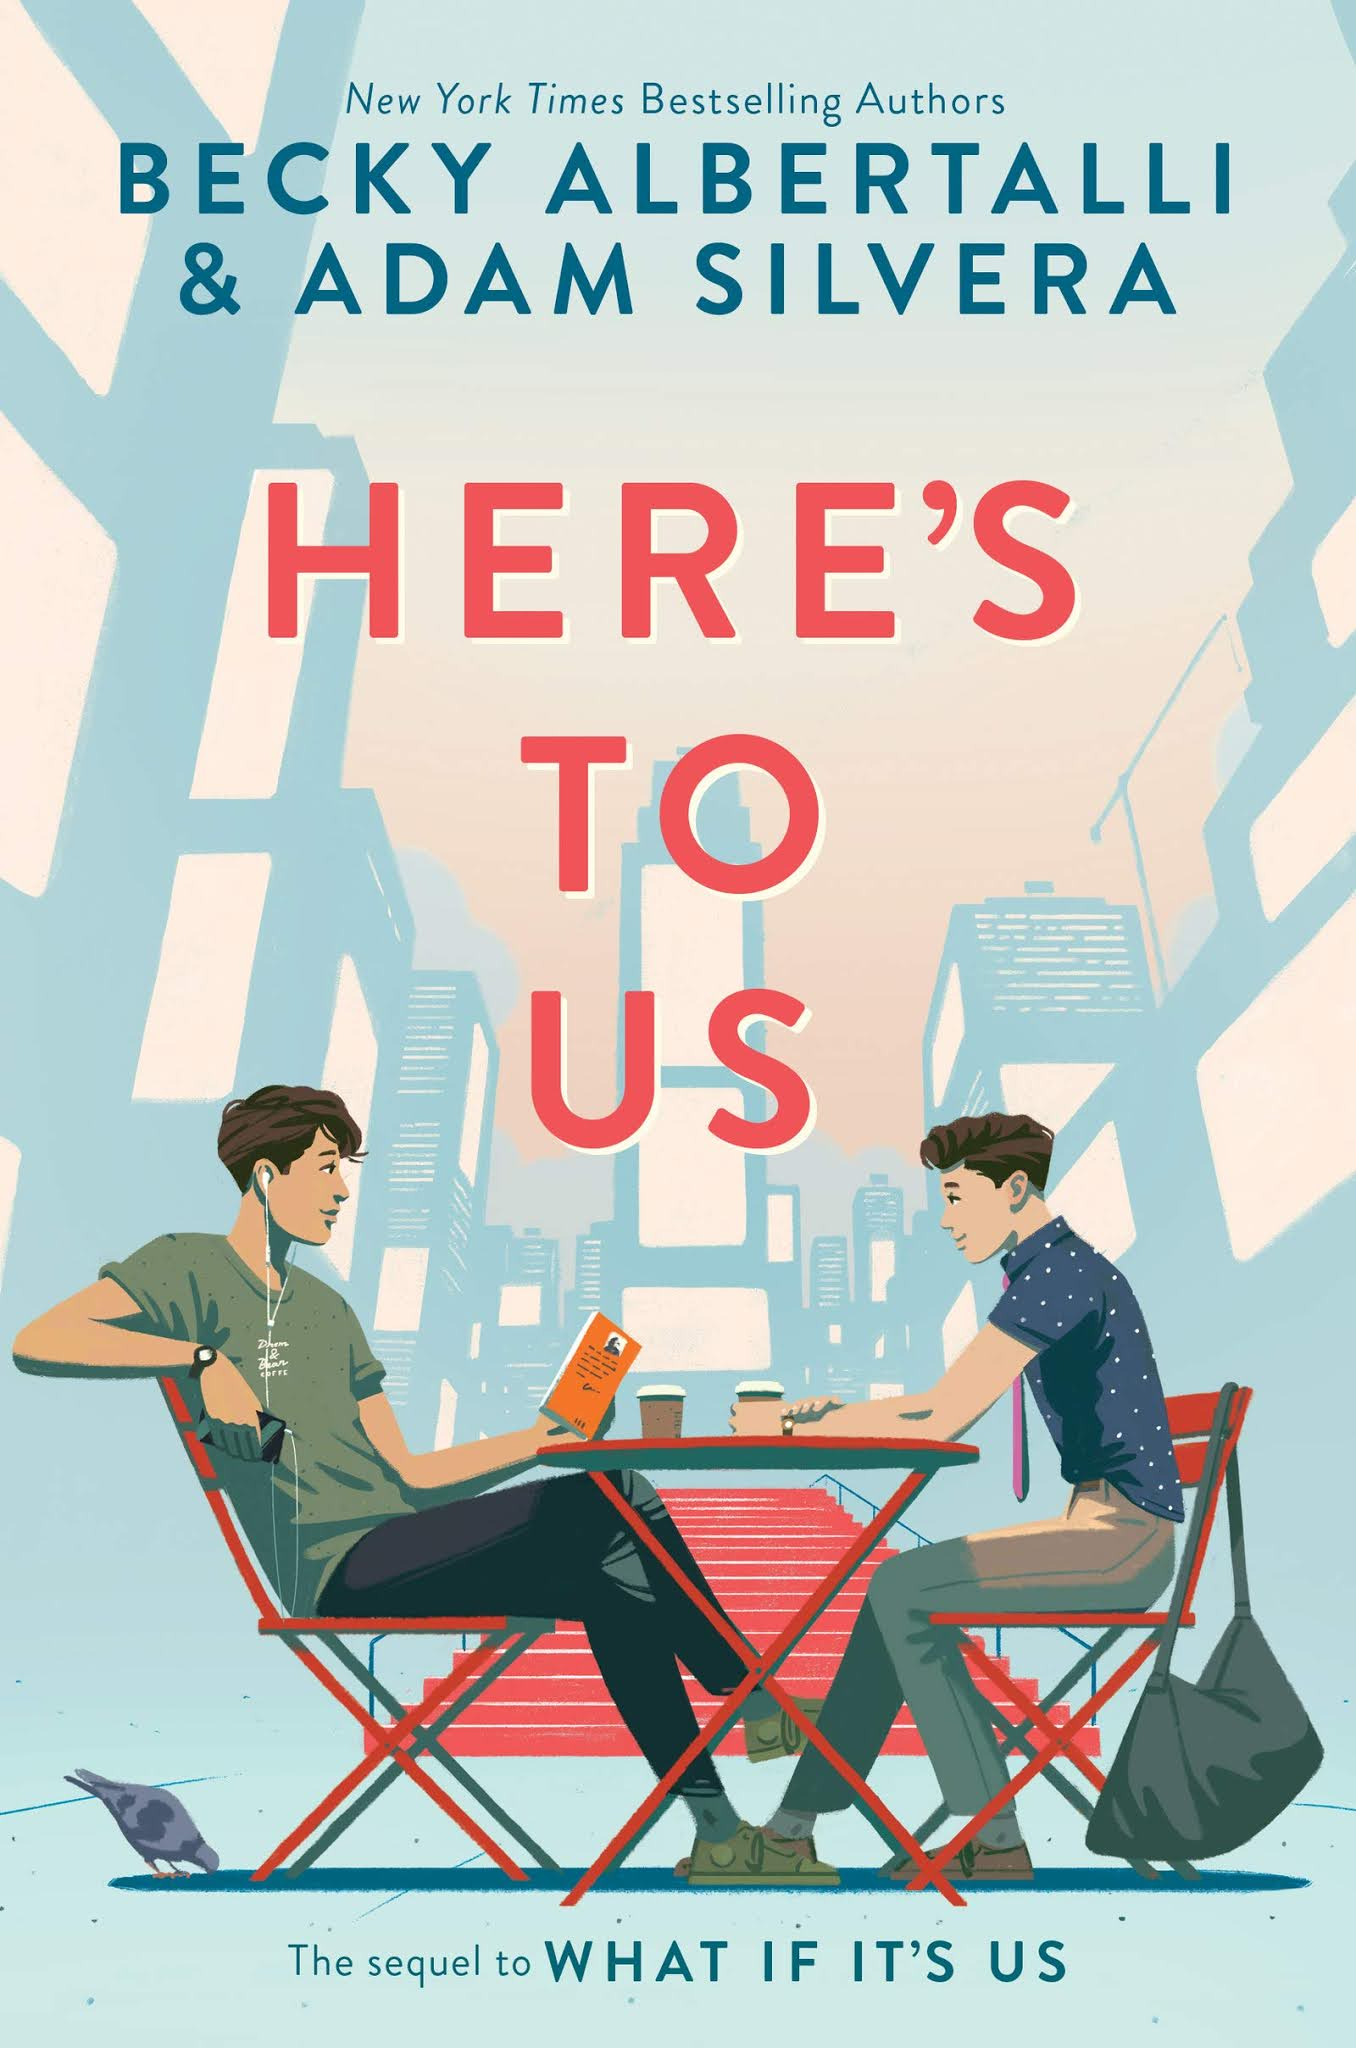 Here's to Us by Becky Albertalli & Adam Silvera